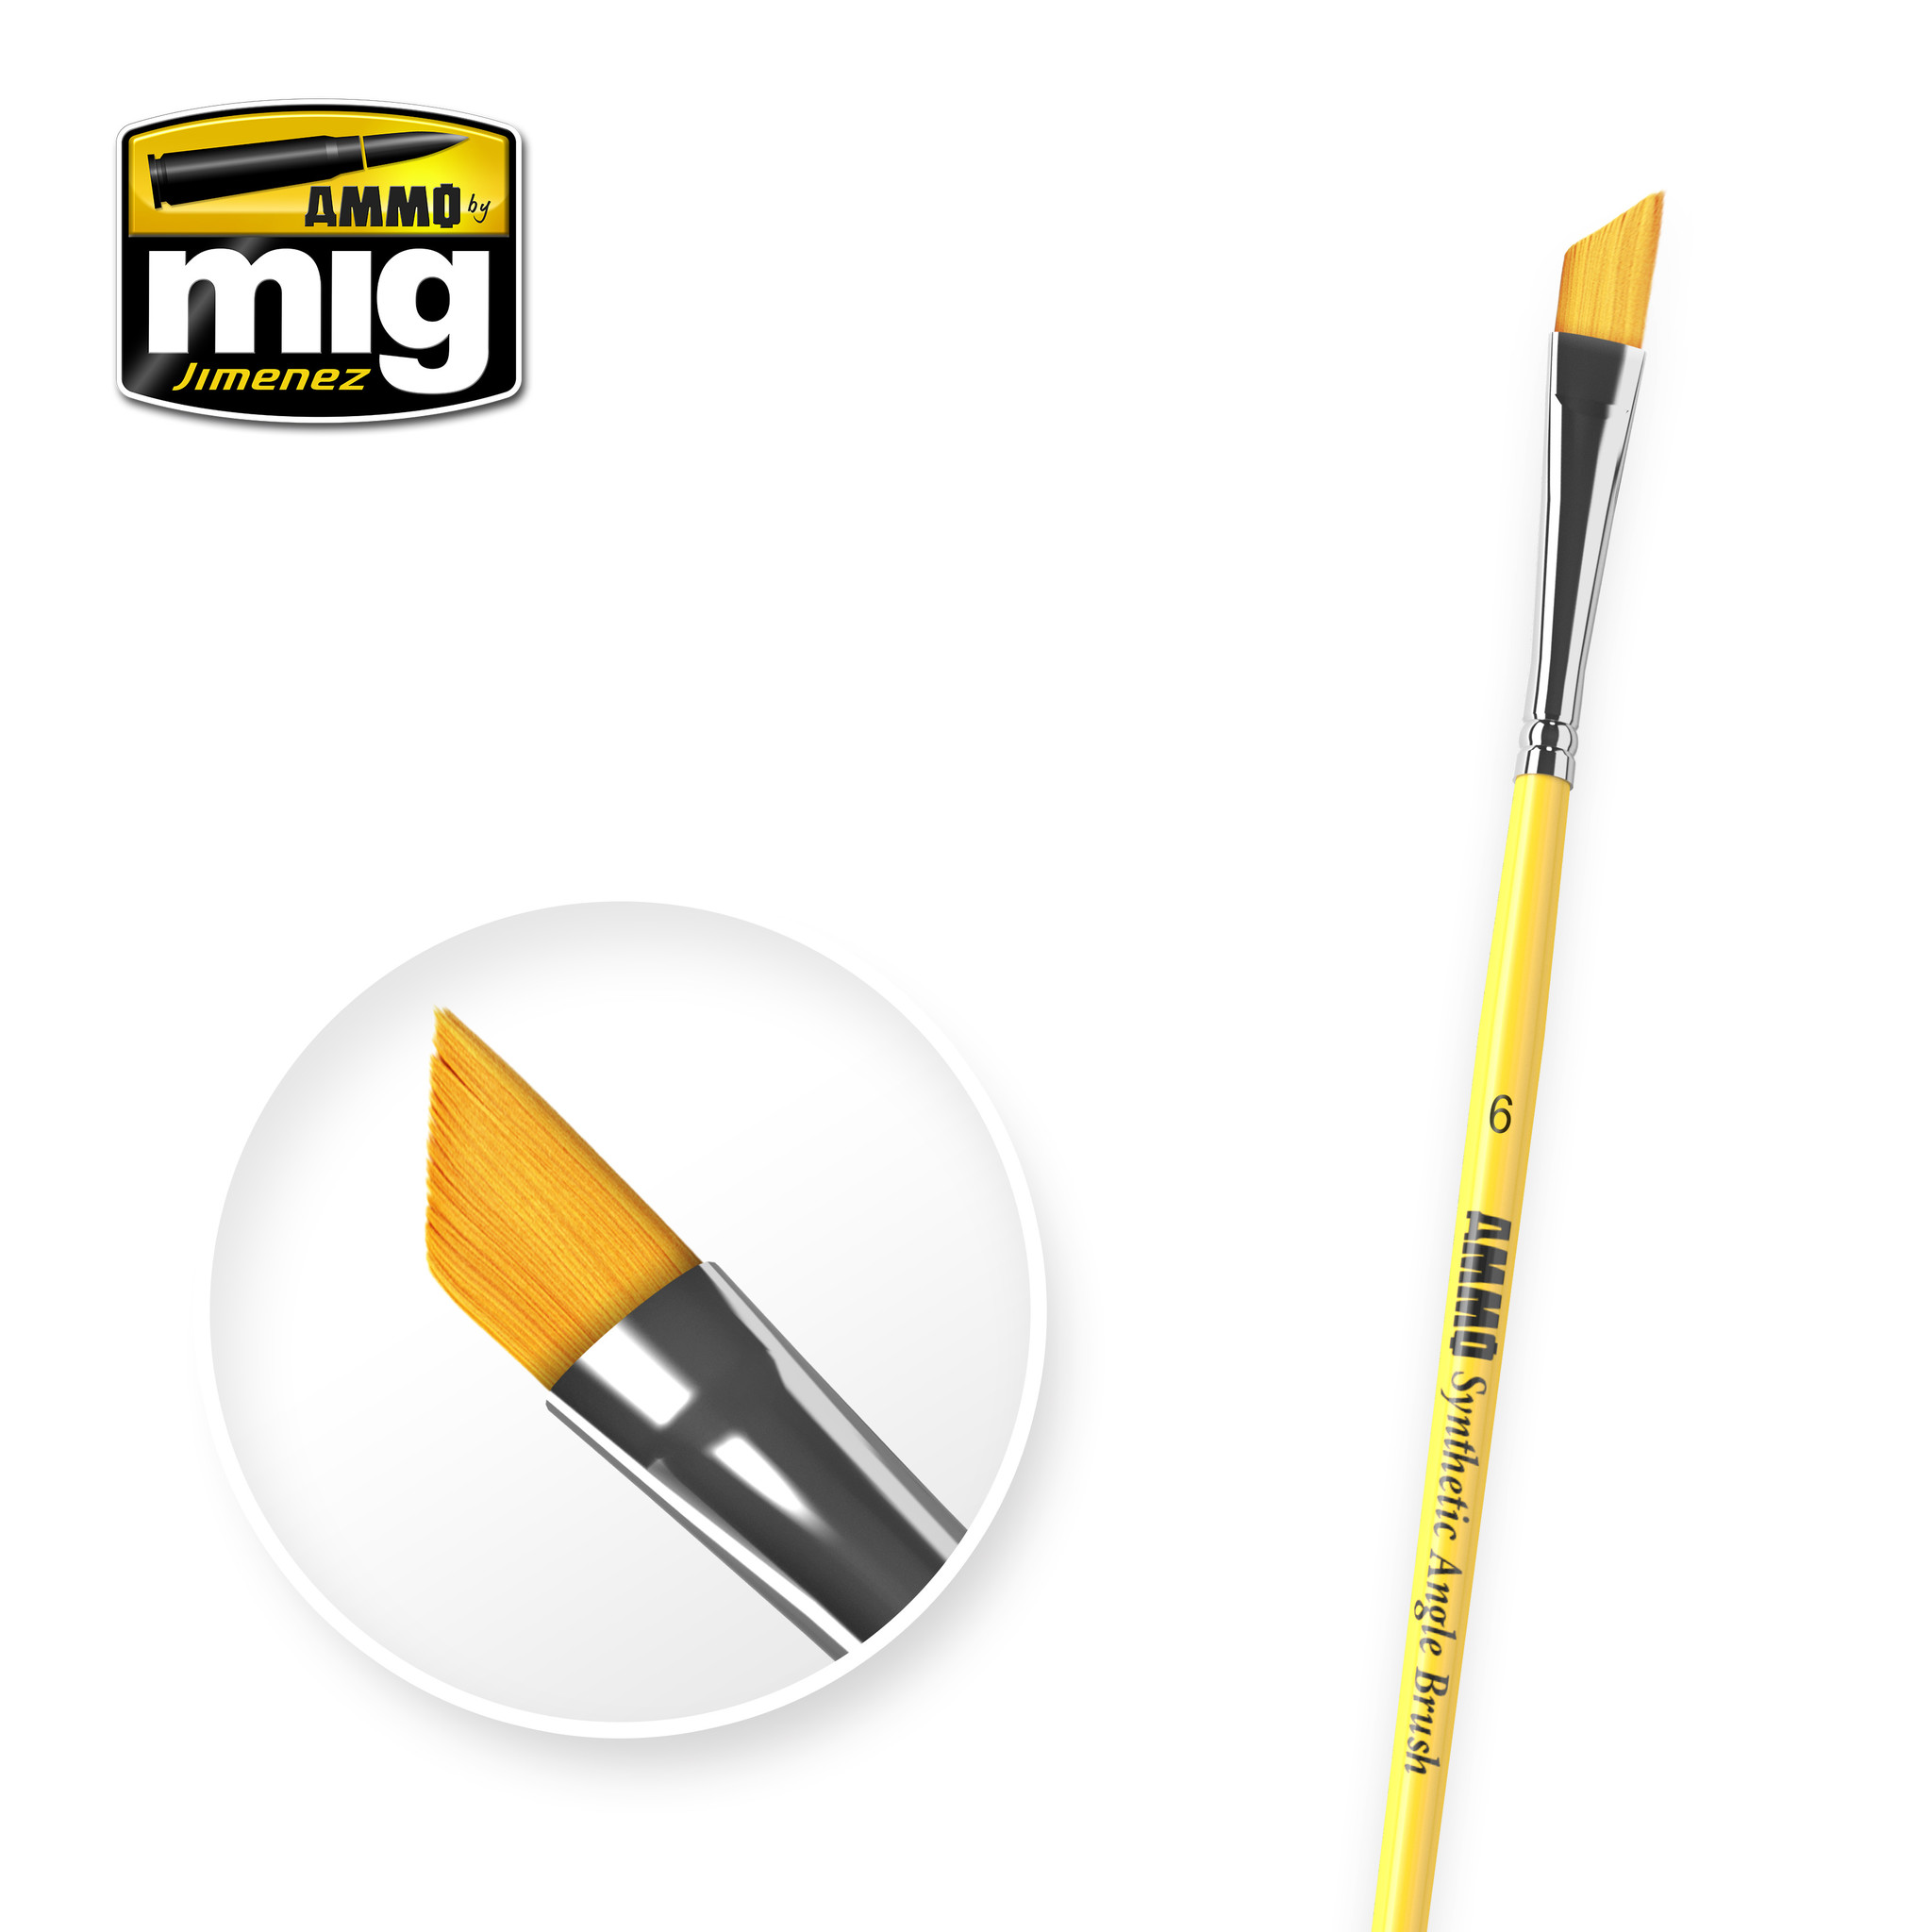 Ammo by Mig Jimenez 6 Syntetic Angle Brush A.MIG-8607